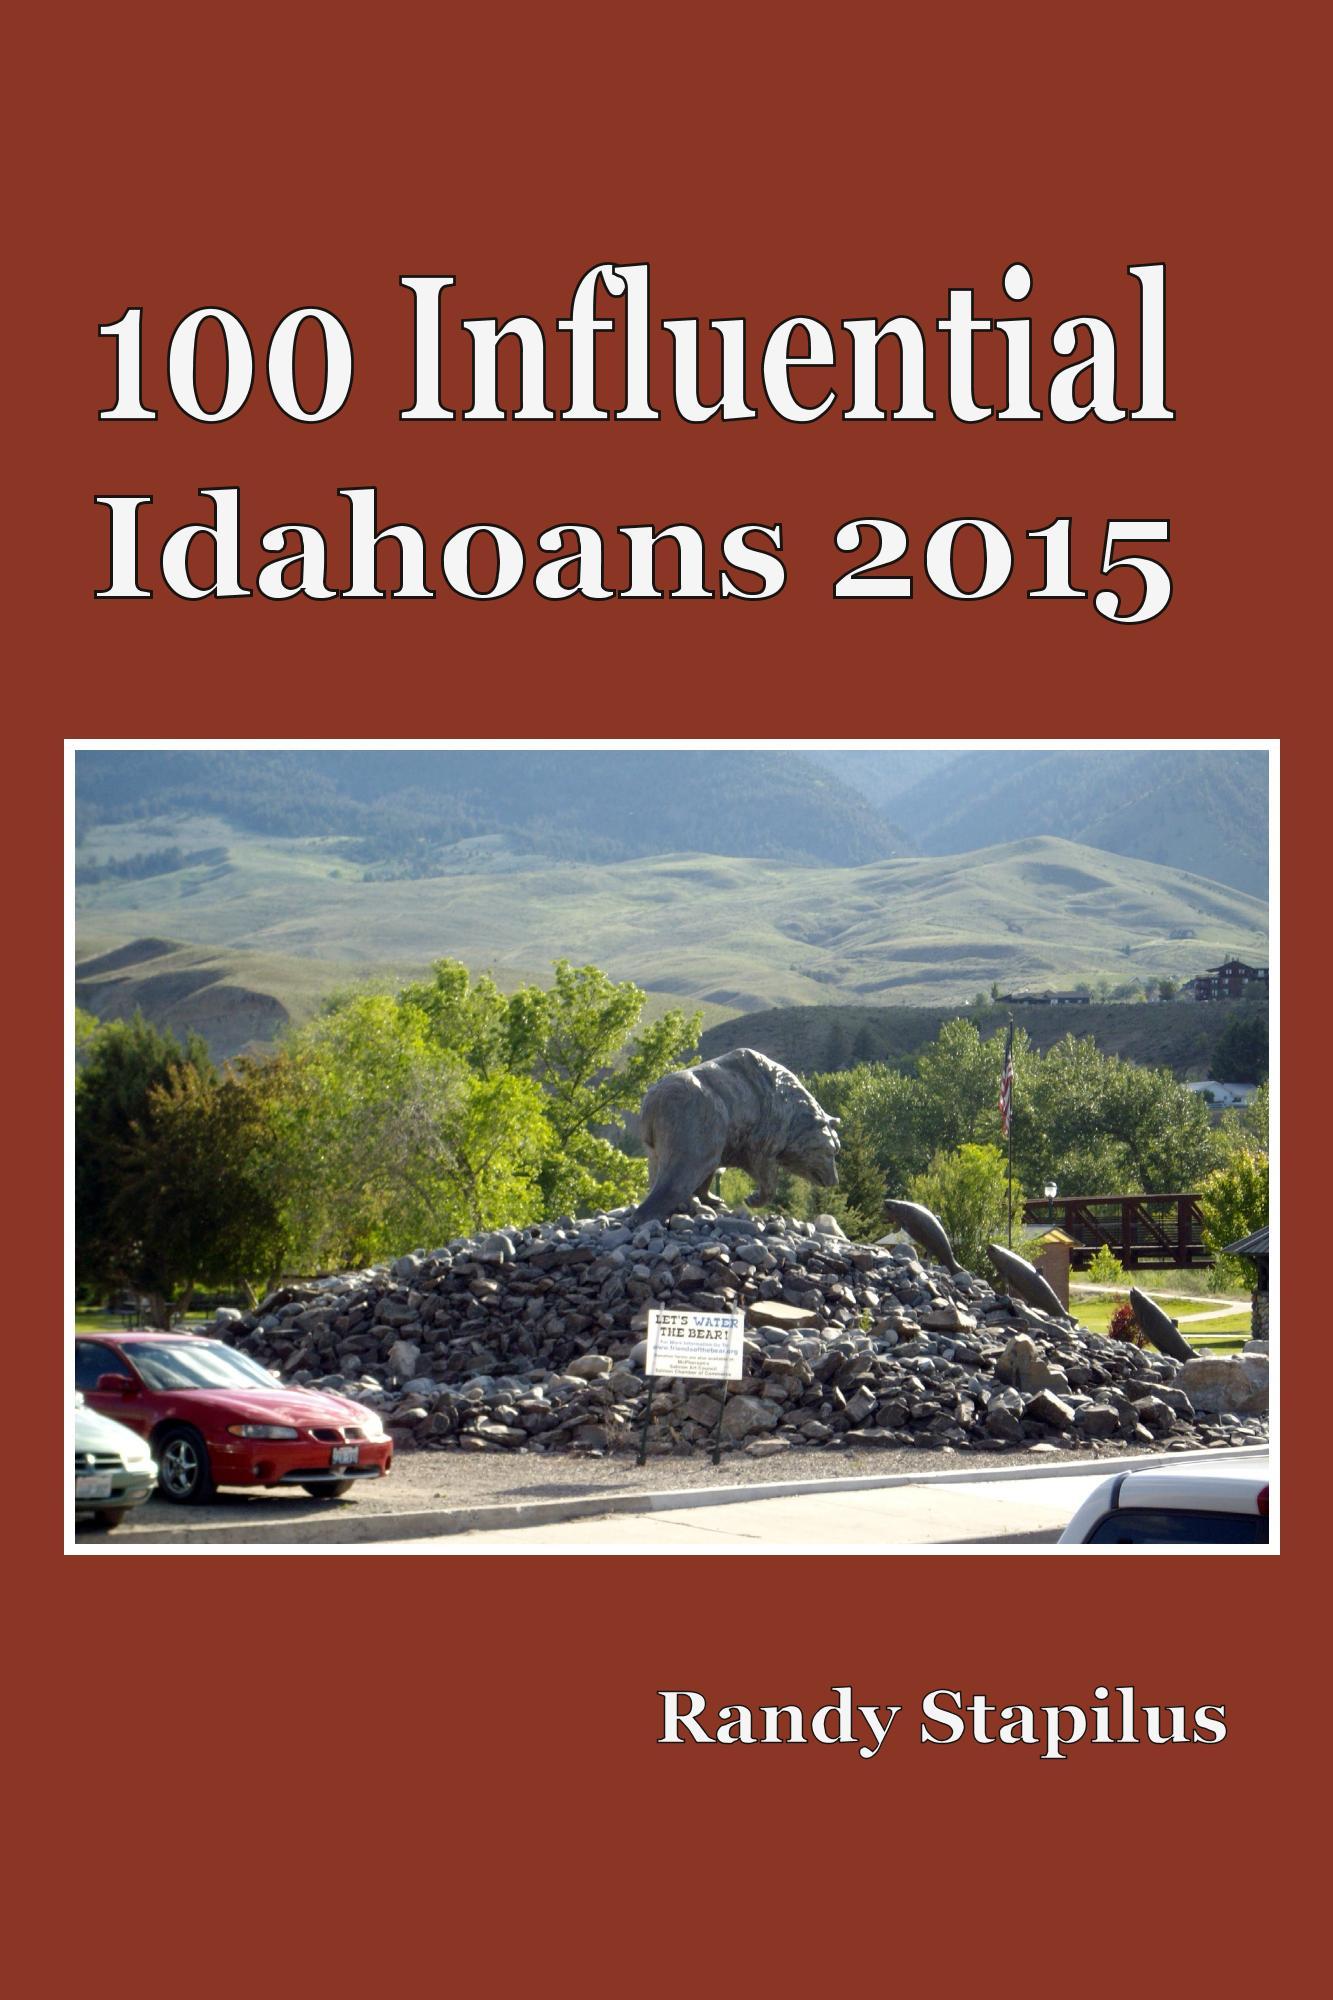 http://ridenbaughpress.com/randystapilus/ridenbaugh-books/100-influential-idahoans-2015/